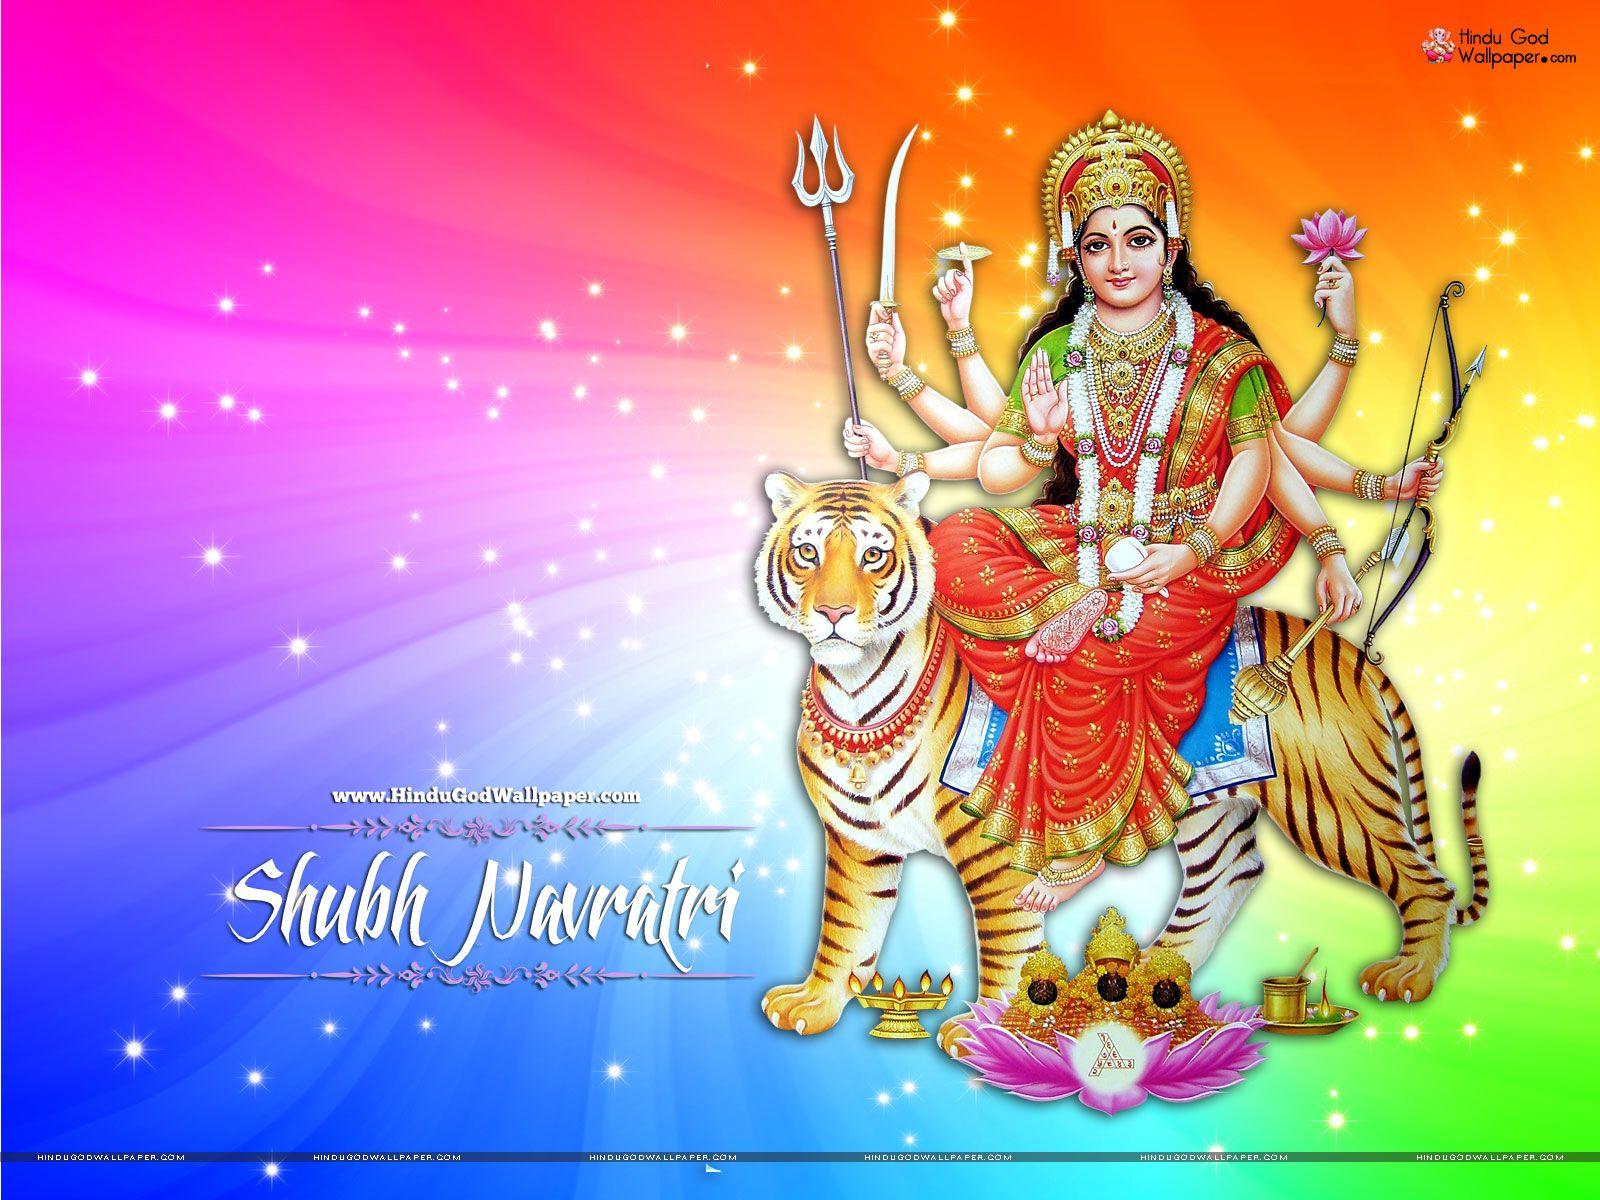 Wallpaper download navratri - Navratri Wishes Photos Wallpapers Free Download